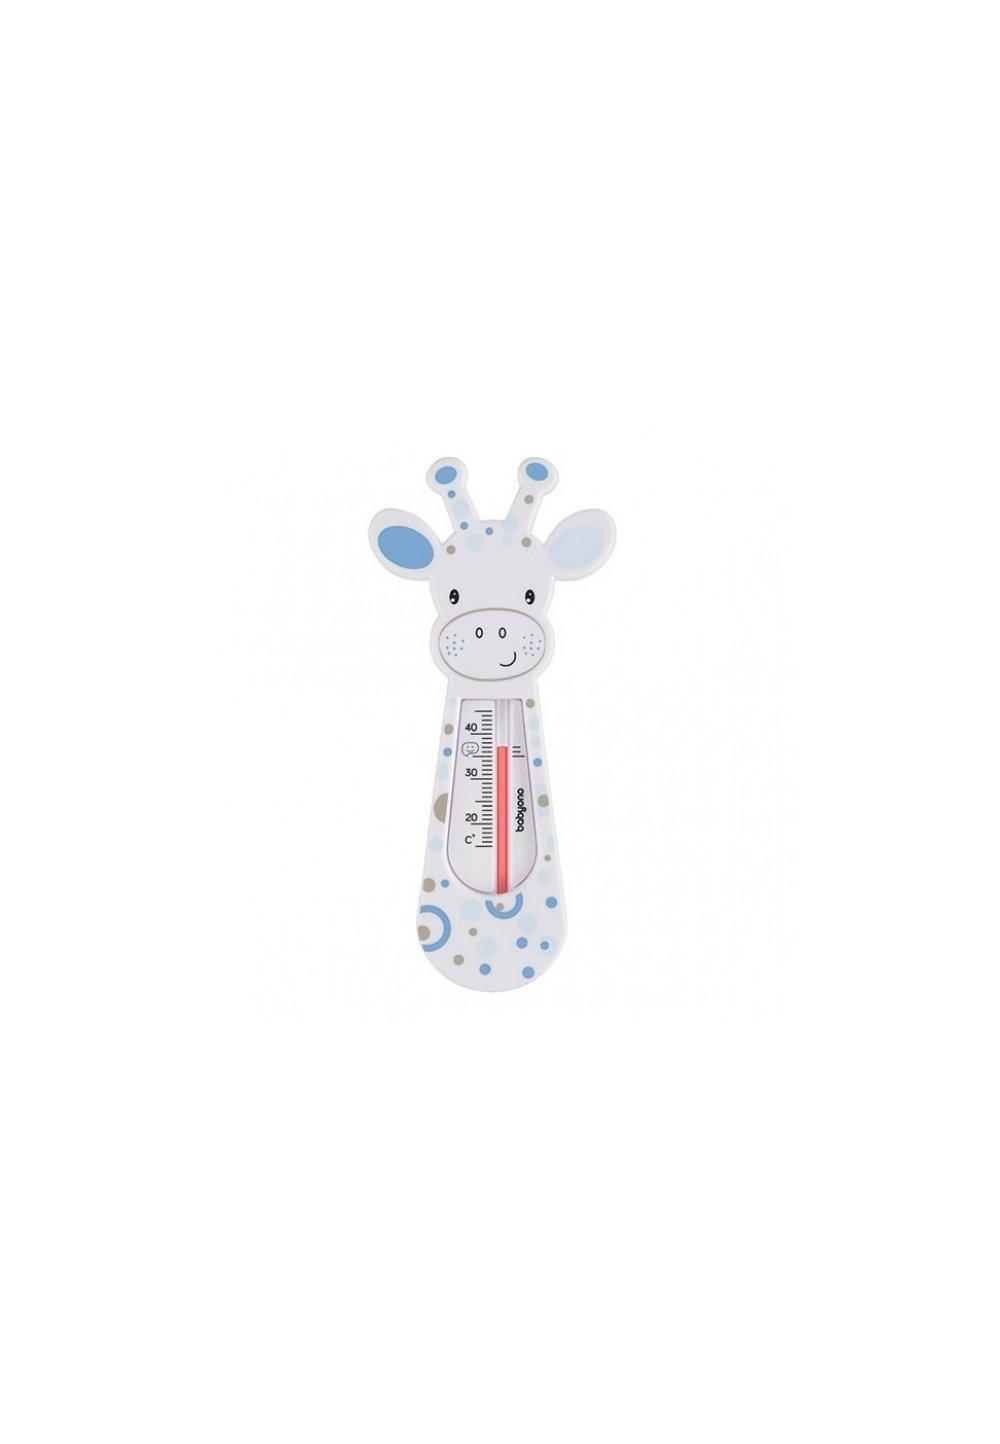 Termometru pentru baie, girafa alba cu buline albastre imagine